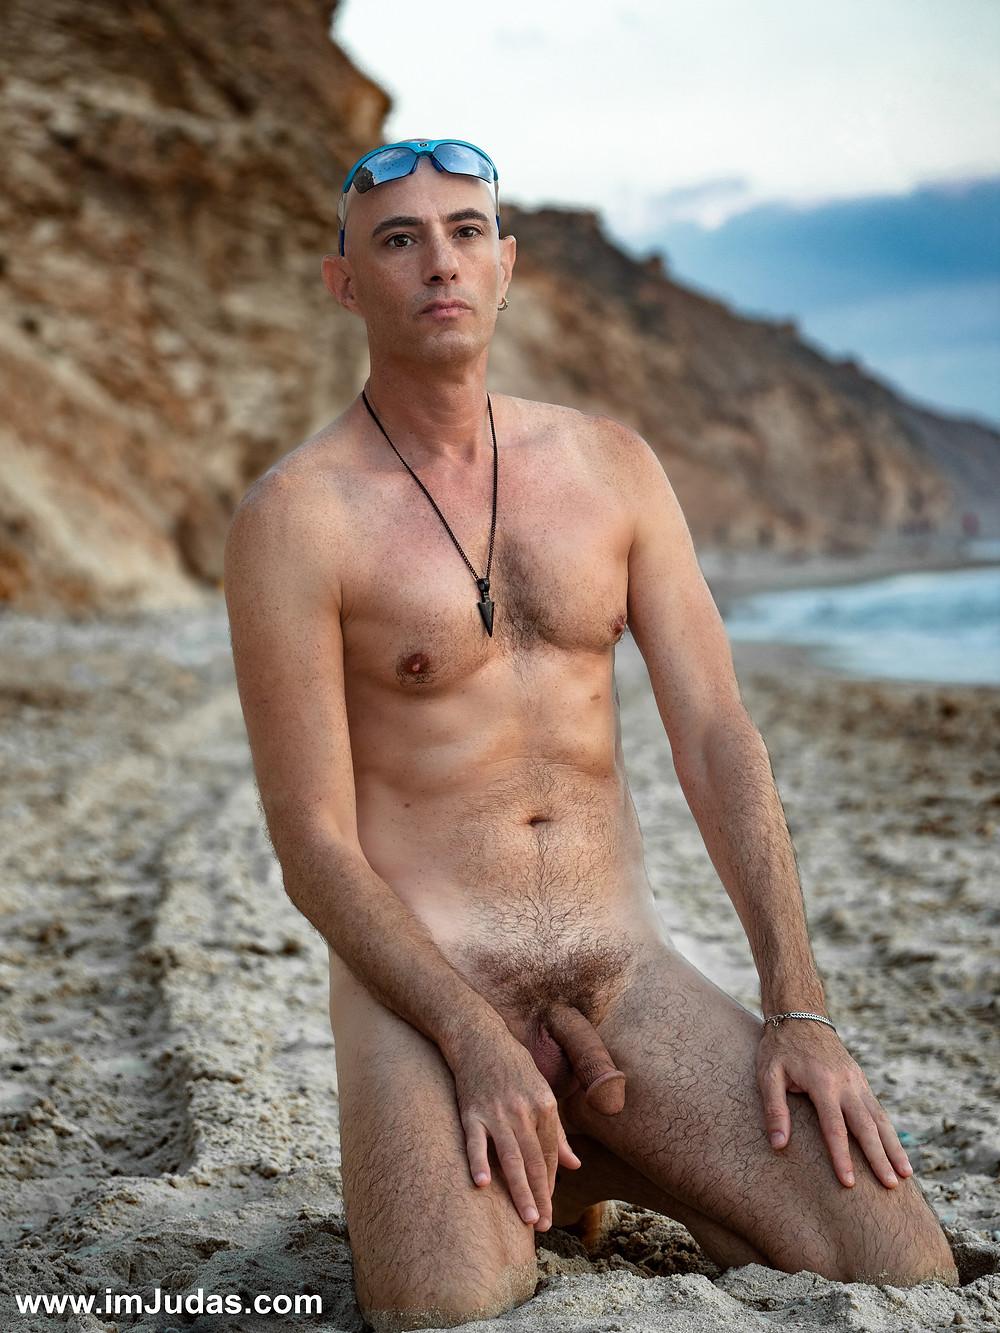 A naked man